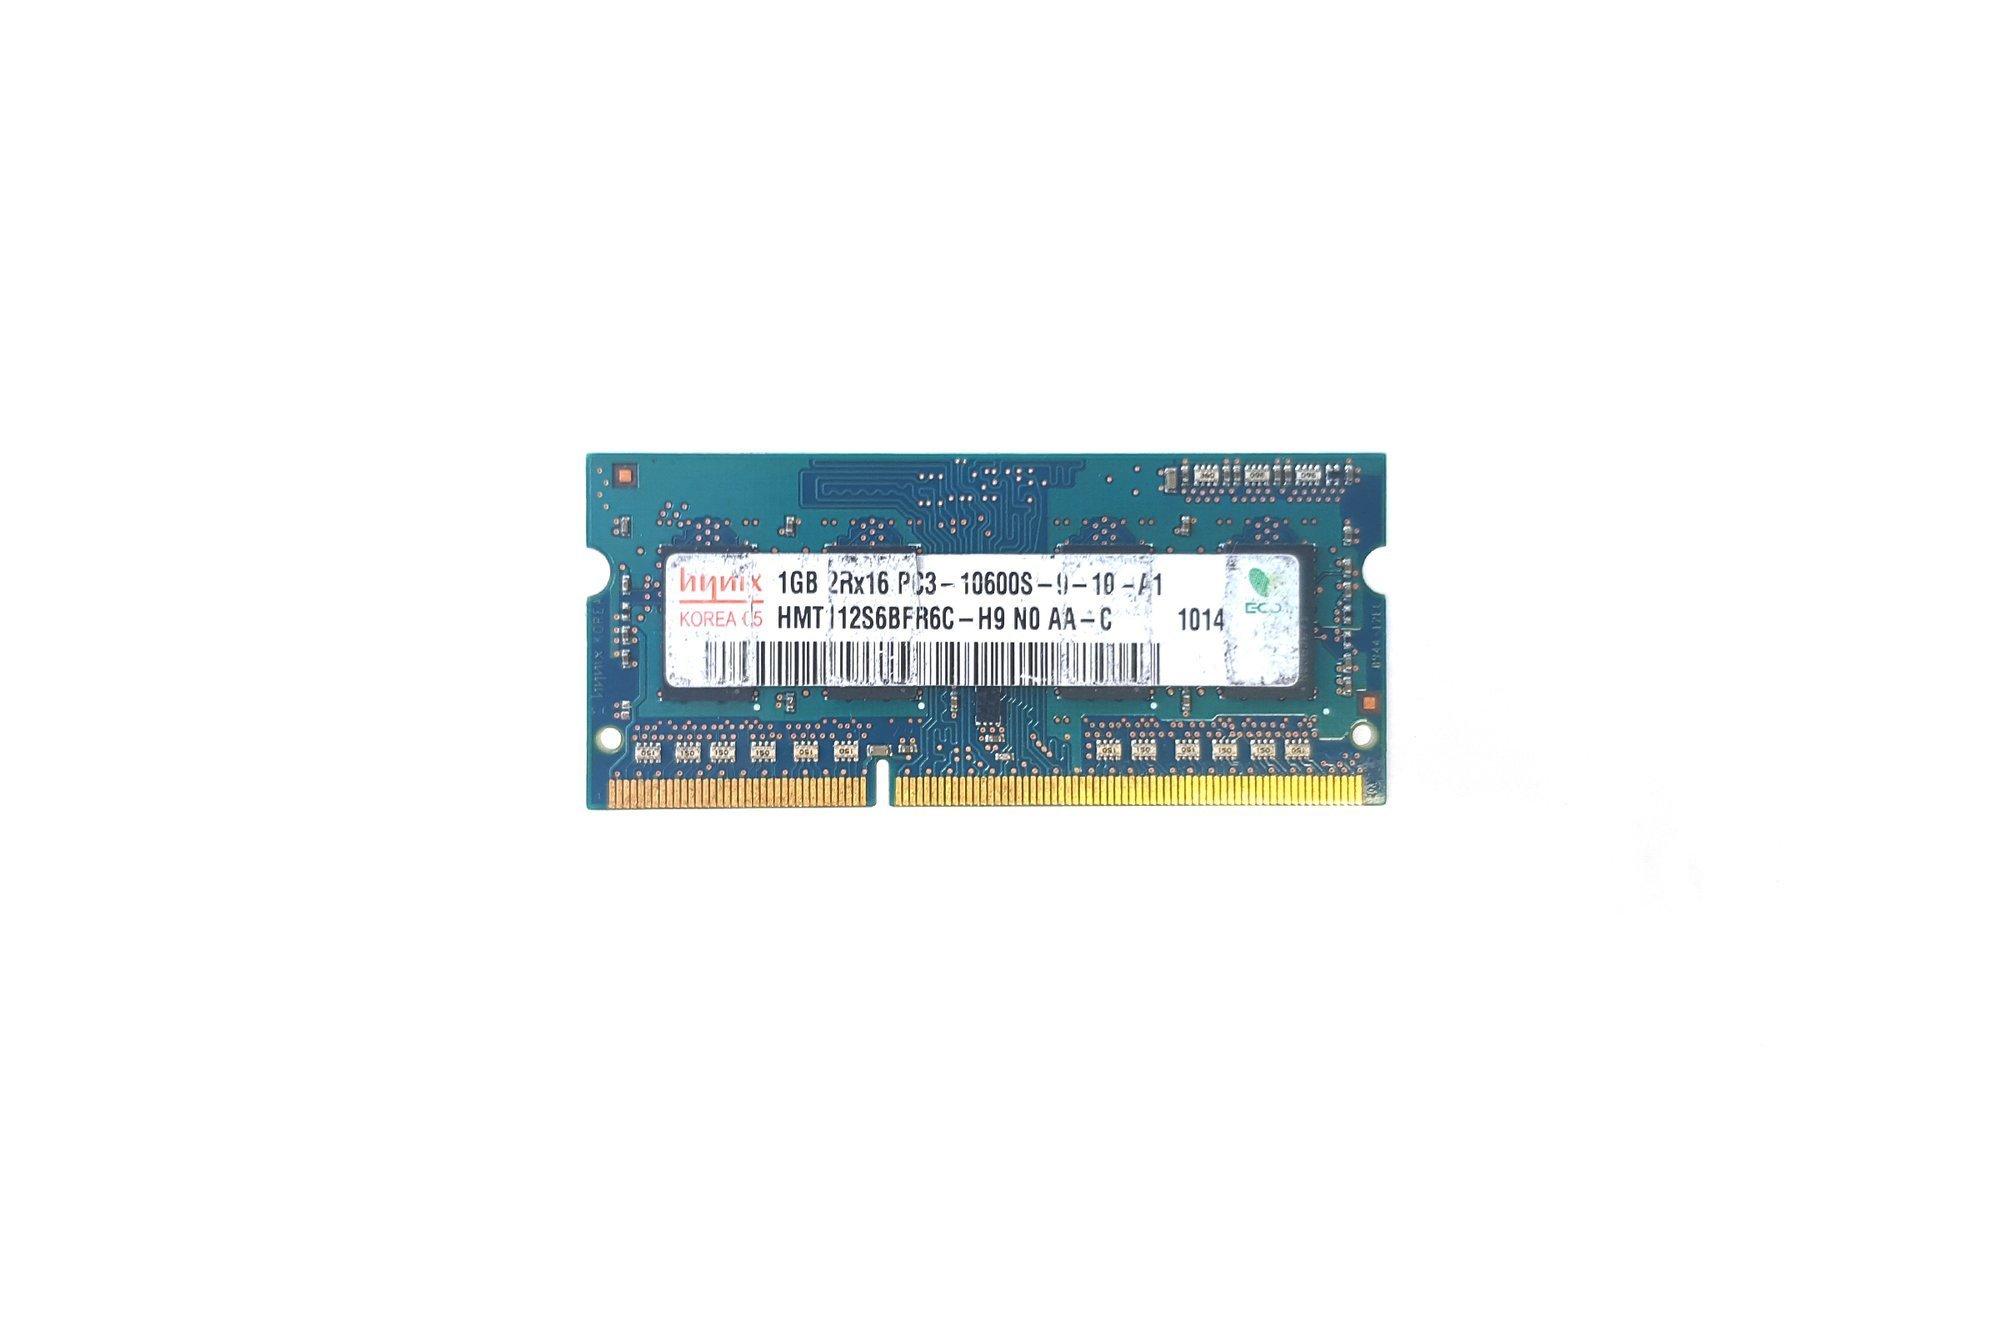 Pamięć SODIMM RAM Hynix 1GB DDR3 HMT112S6BFR6C-H9